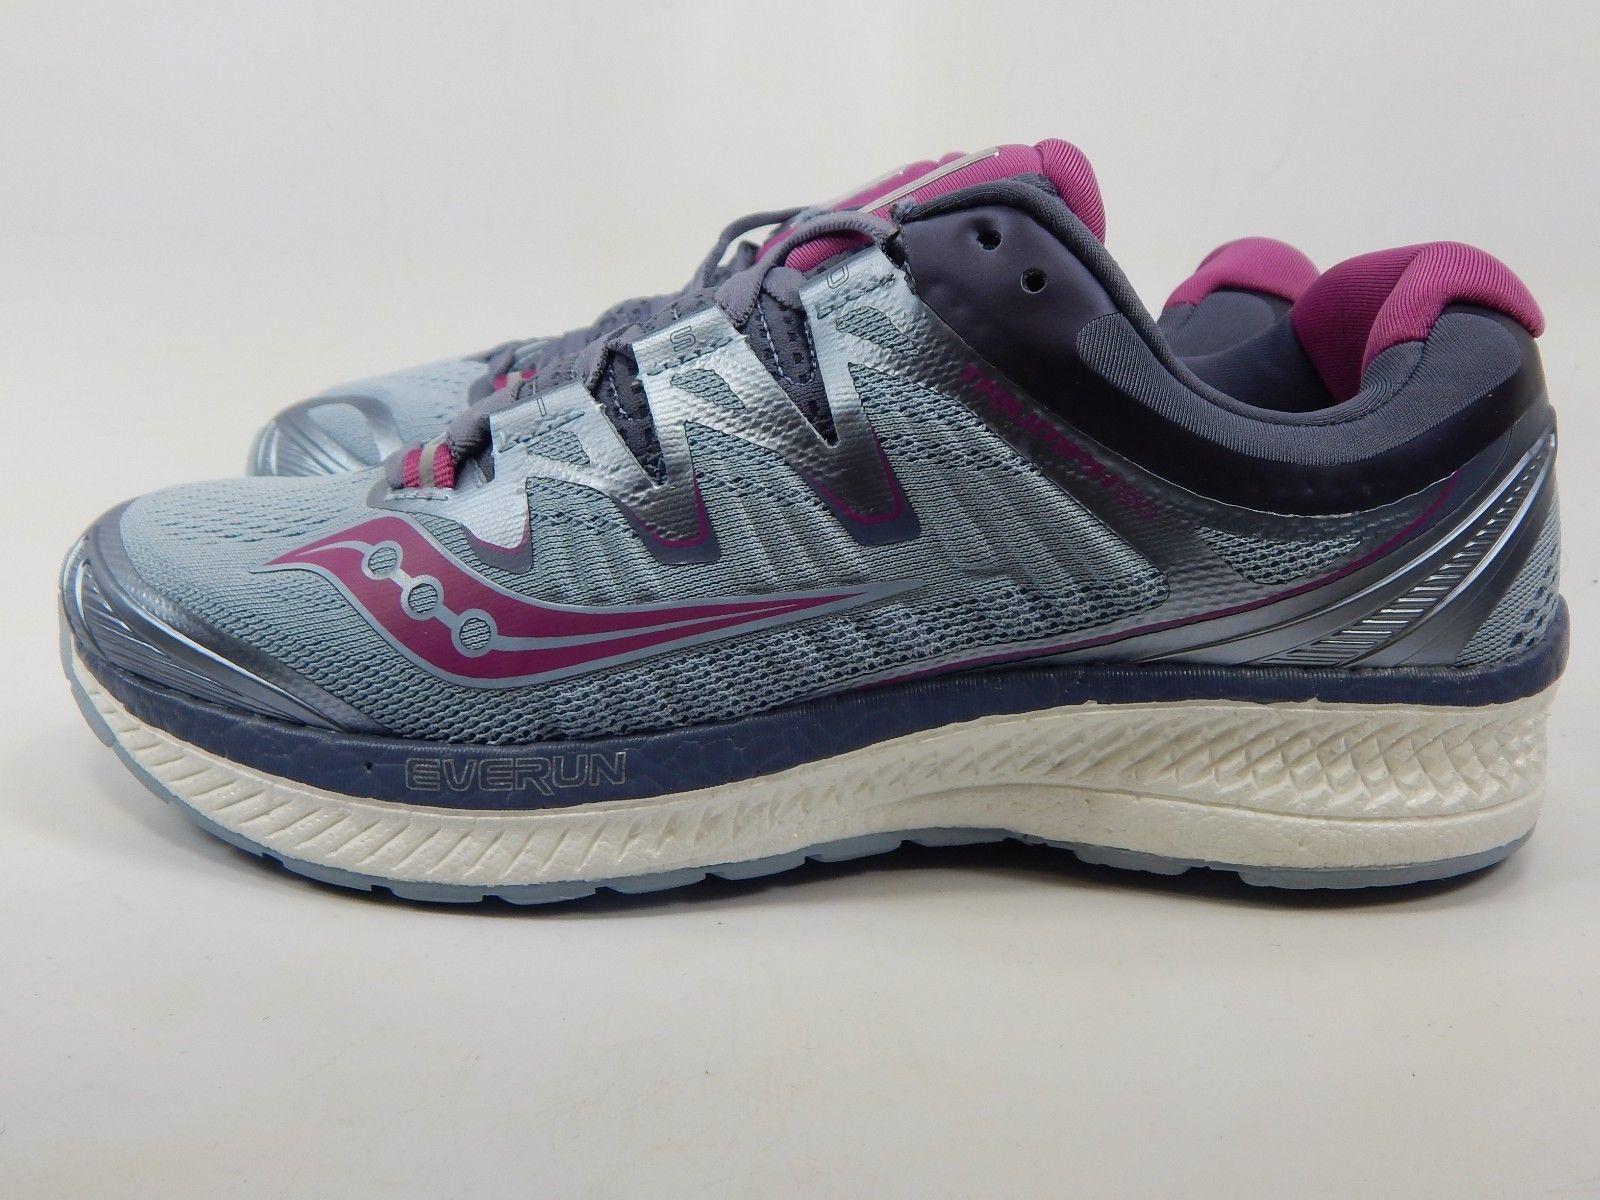 Saucony Triumph ISO 4 Size US 8 M (B) EU 39 Women's Running Shoes Gray S10413-1